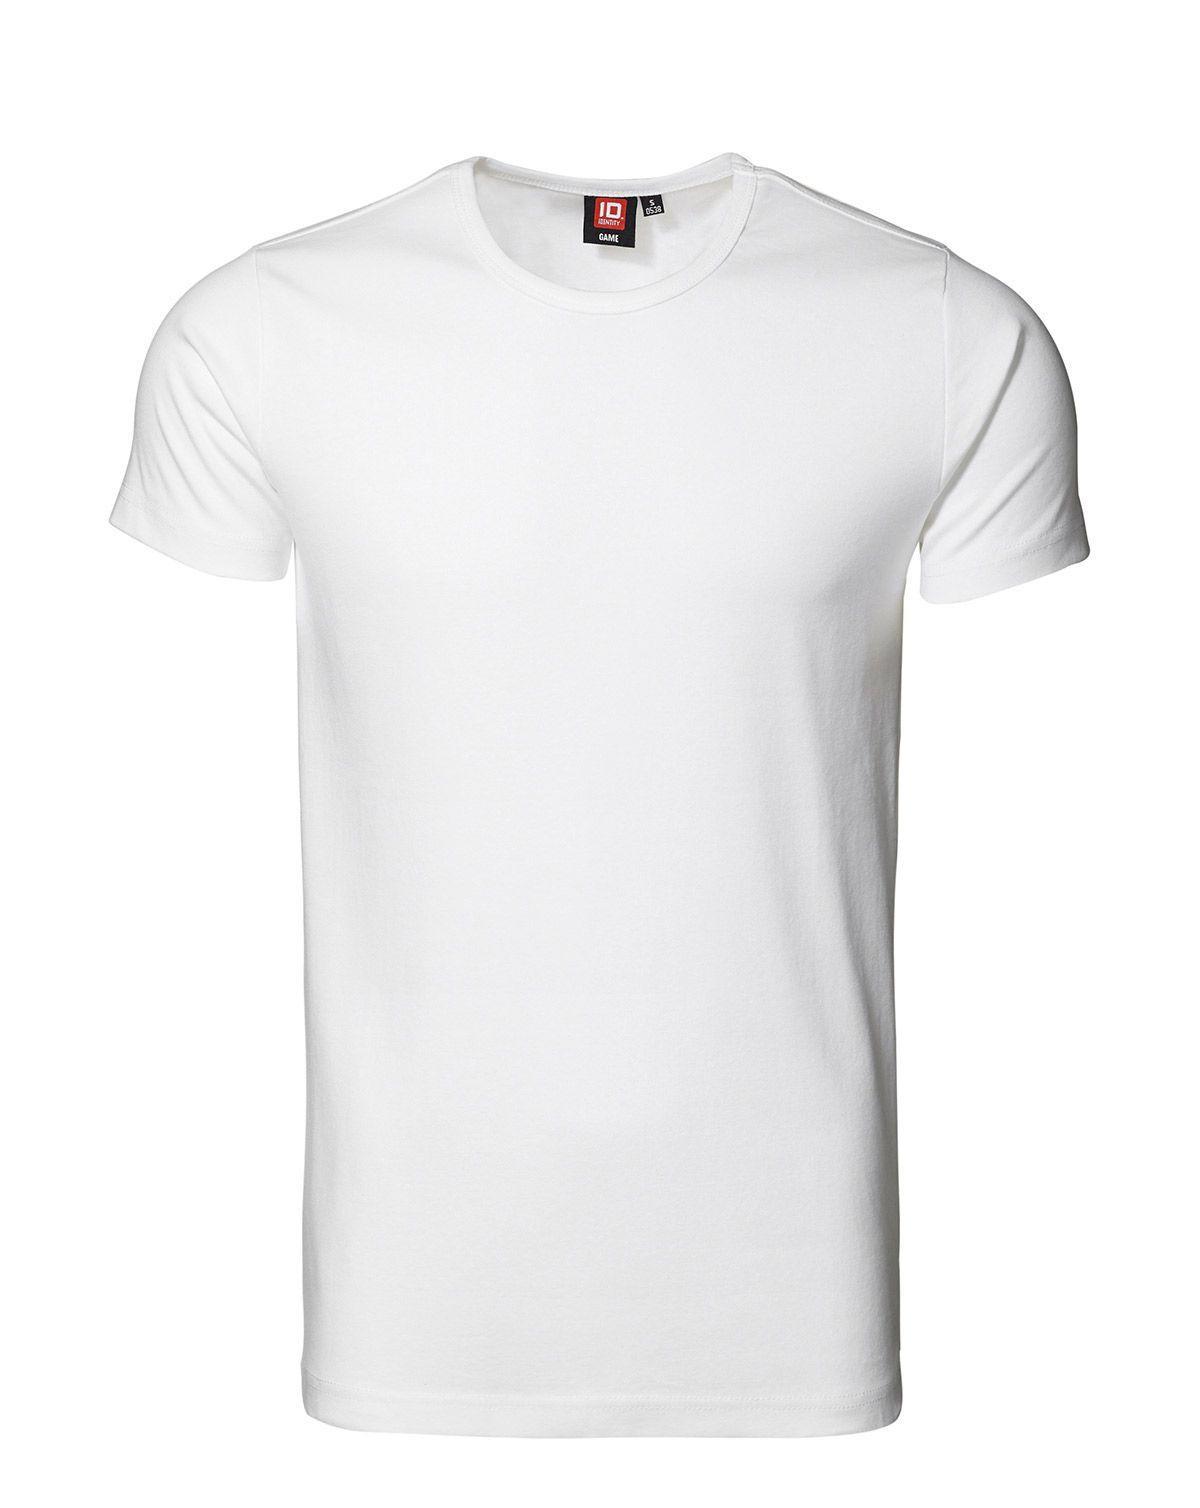 ID 1x1 rib T-shirt (Hvid, 2XL)